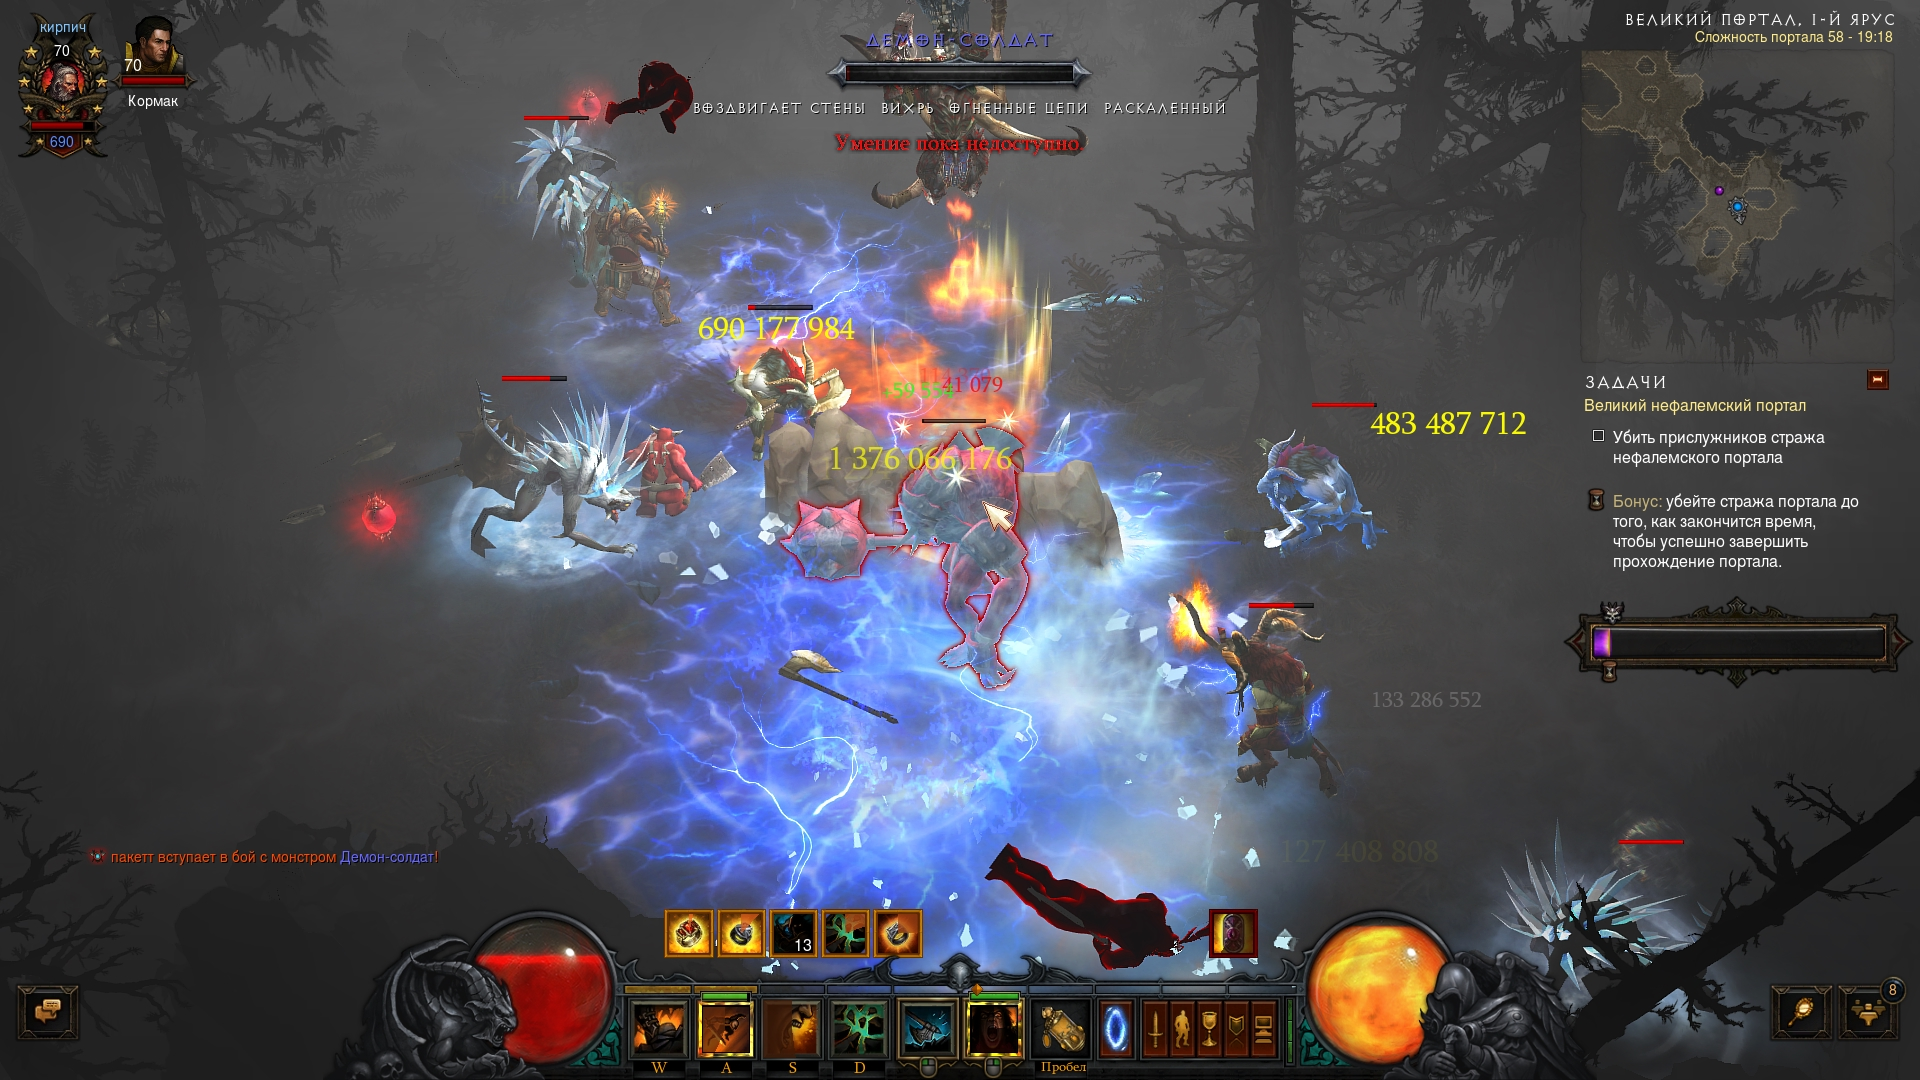 Screenshot003.jpg - Diablo 3